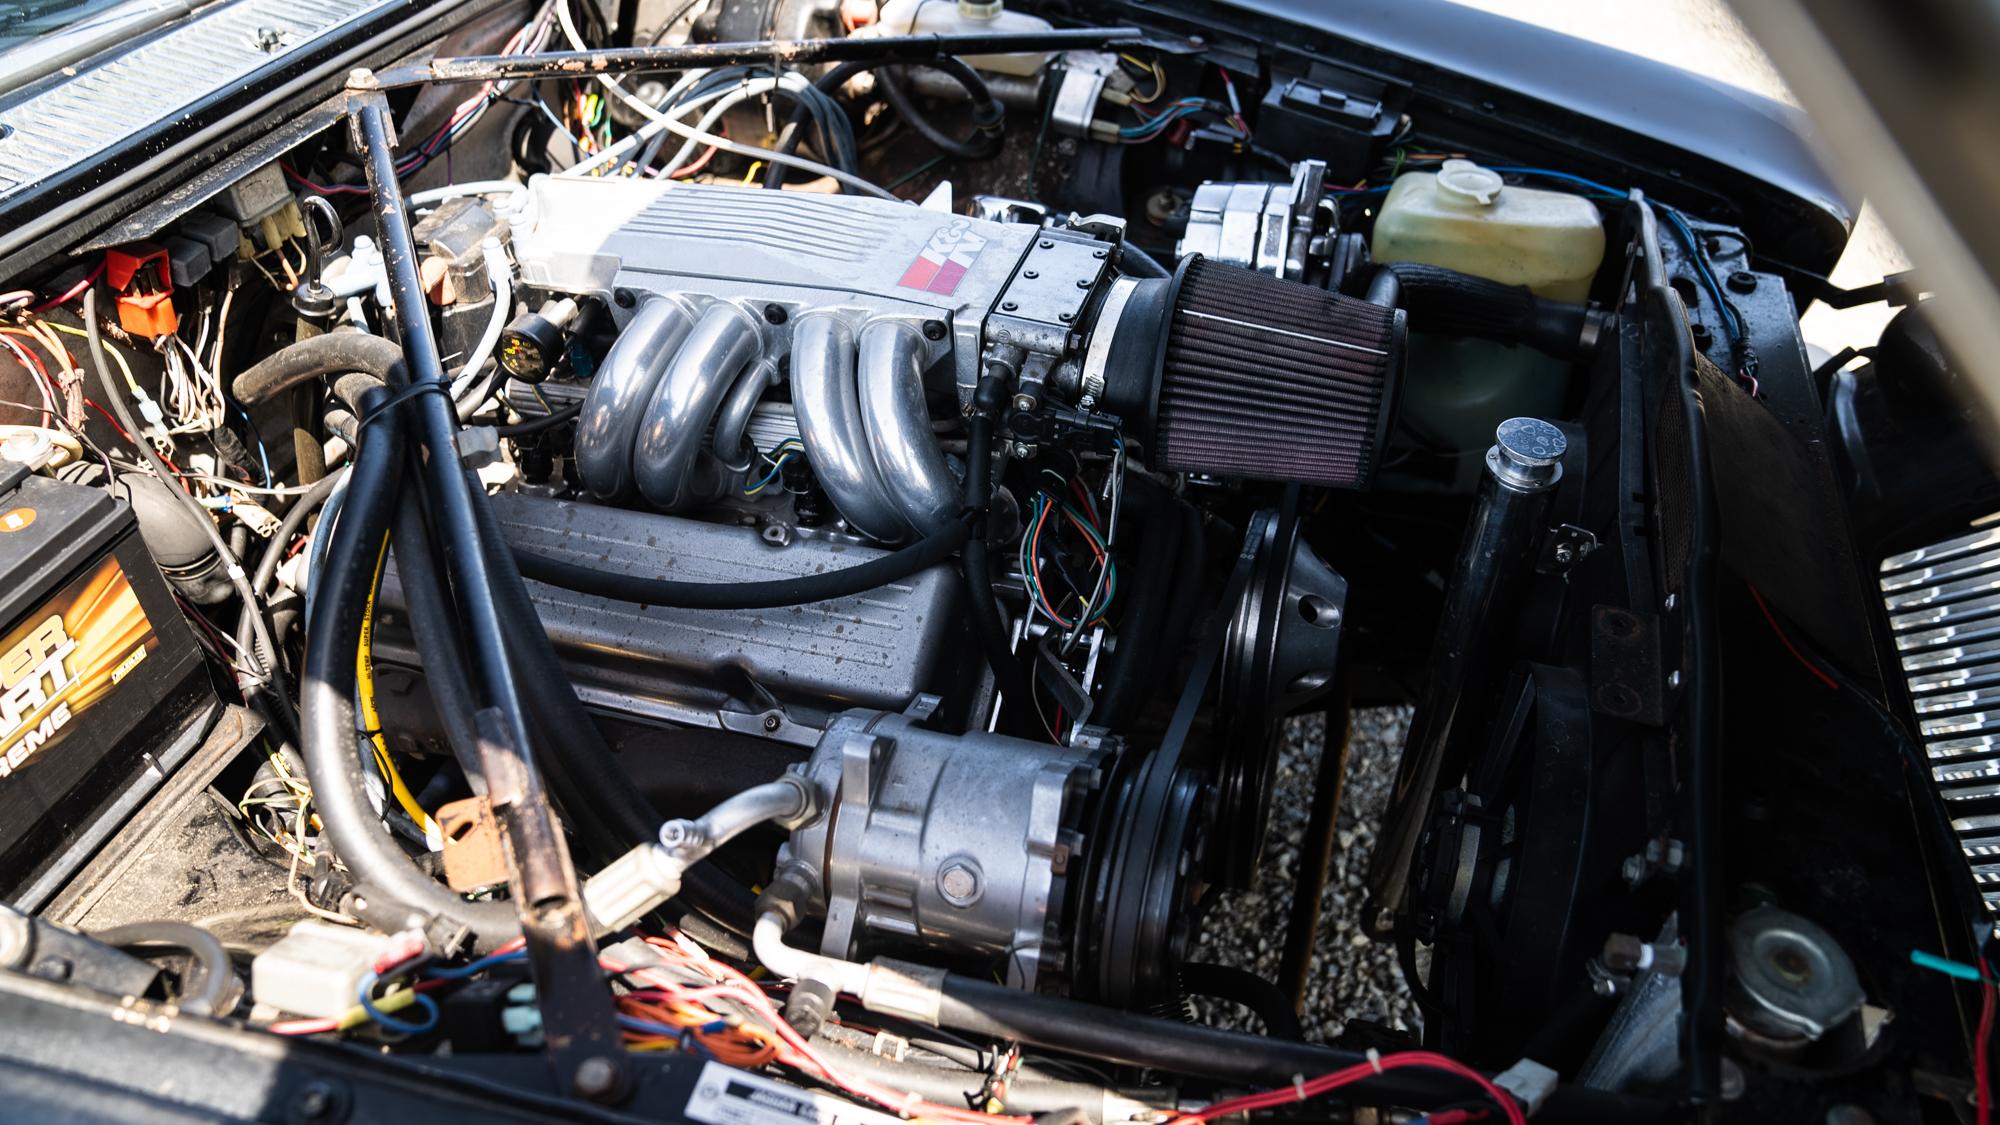 1986 Jaguar XJ6 v8 swap